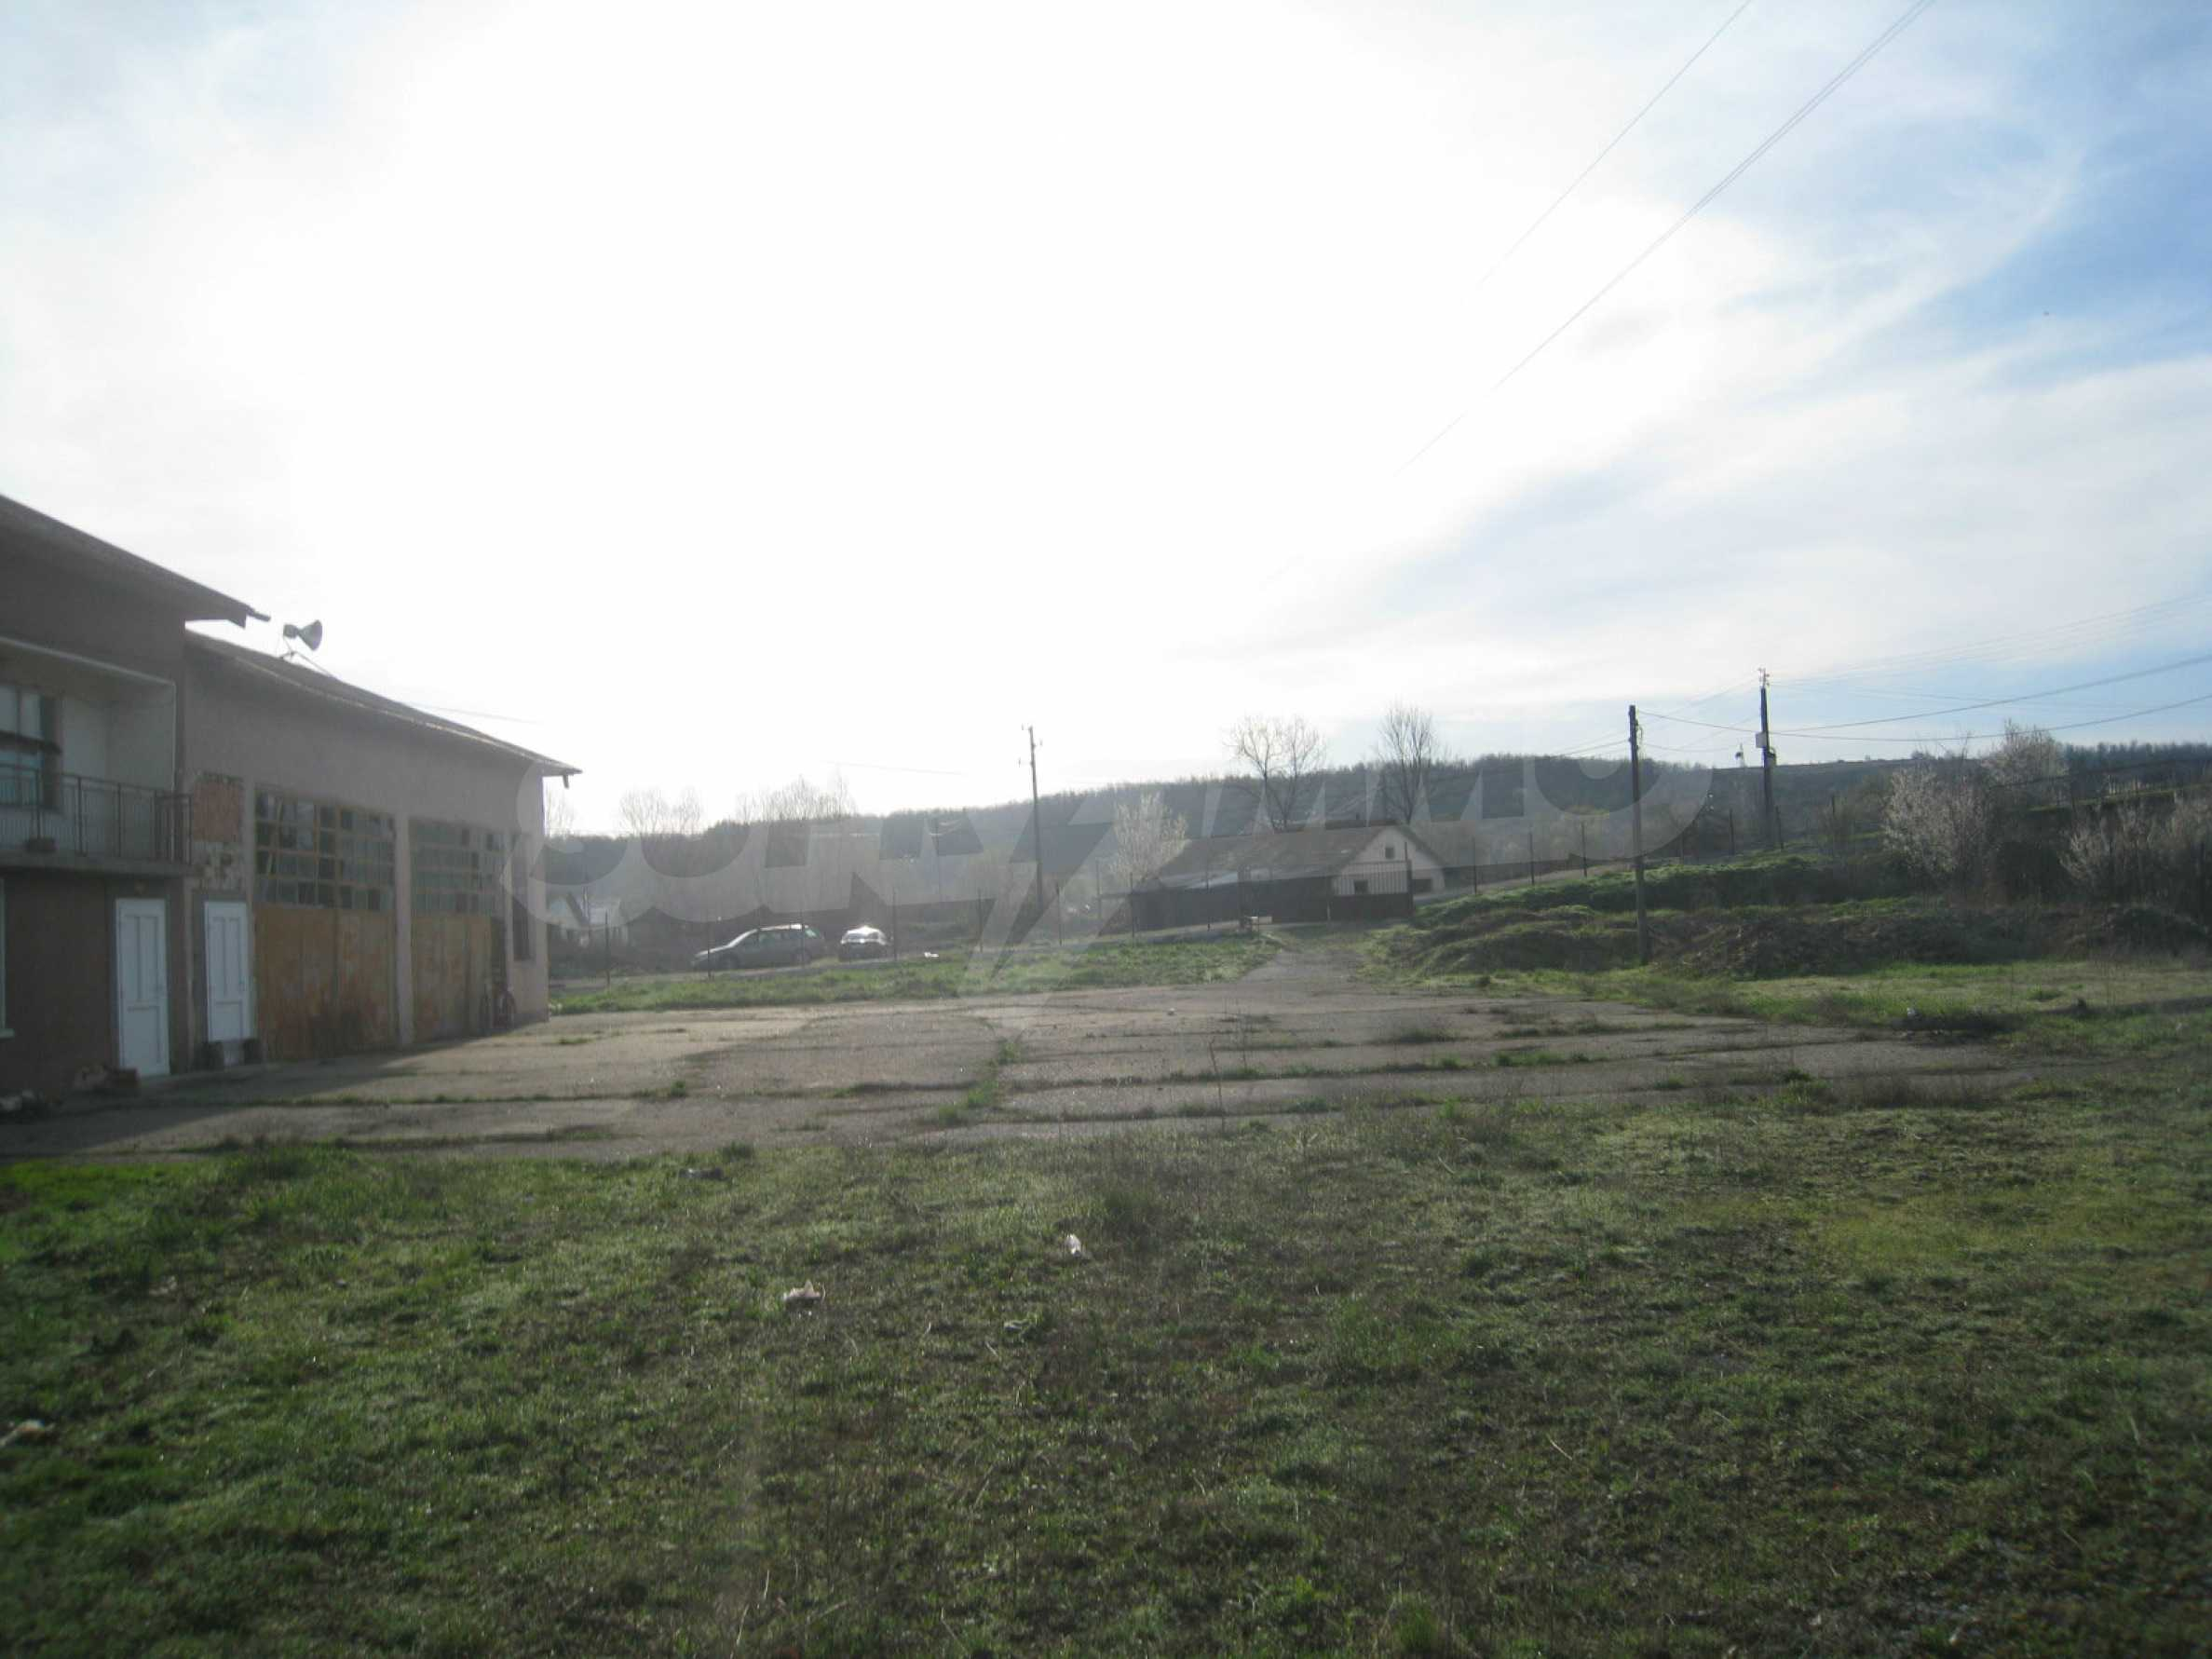 Fishpond, warehouses, residential areas and asphalt ground near Montana 33